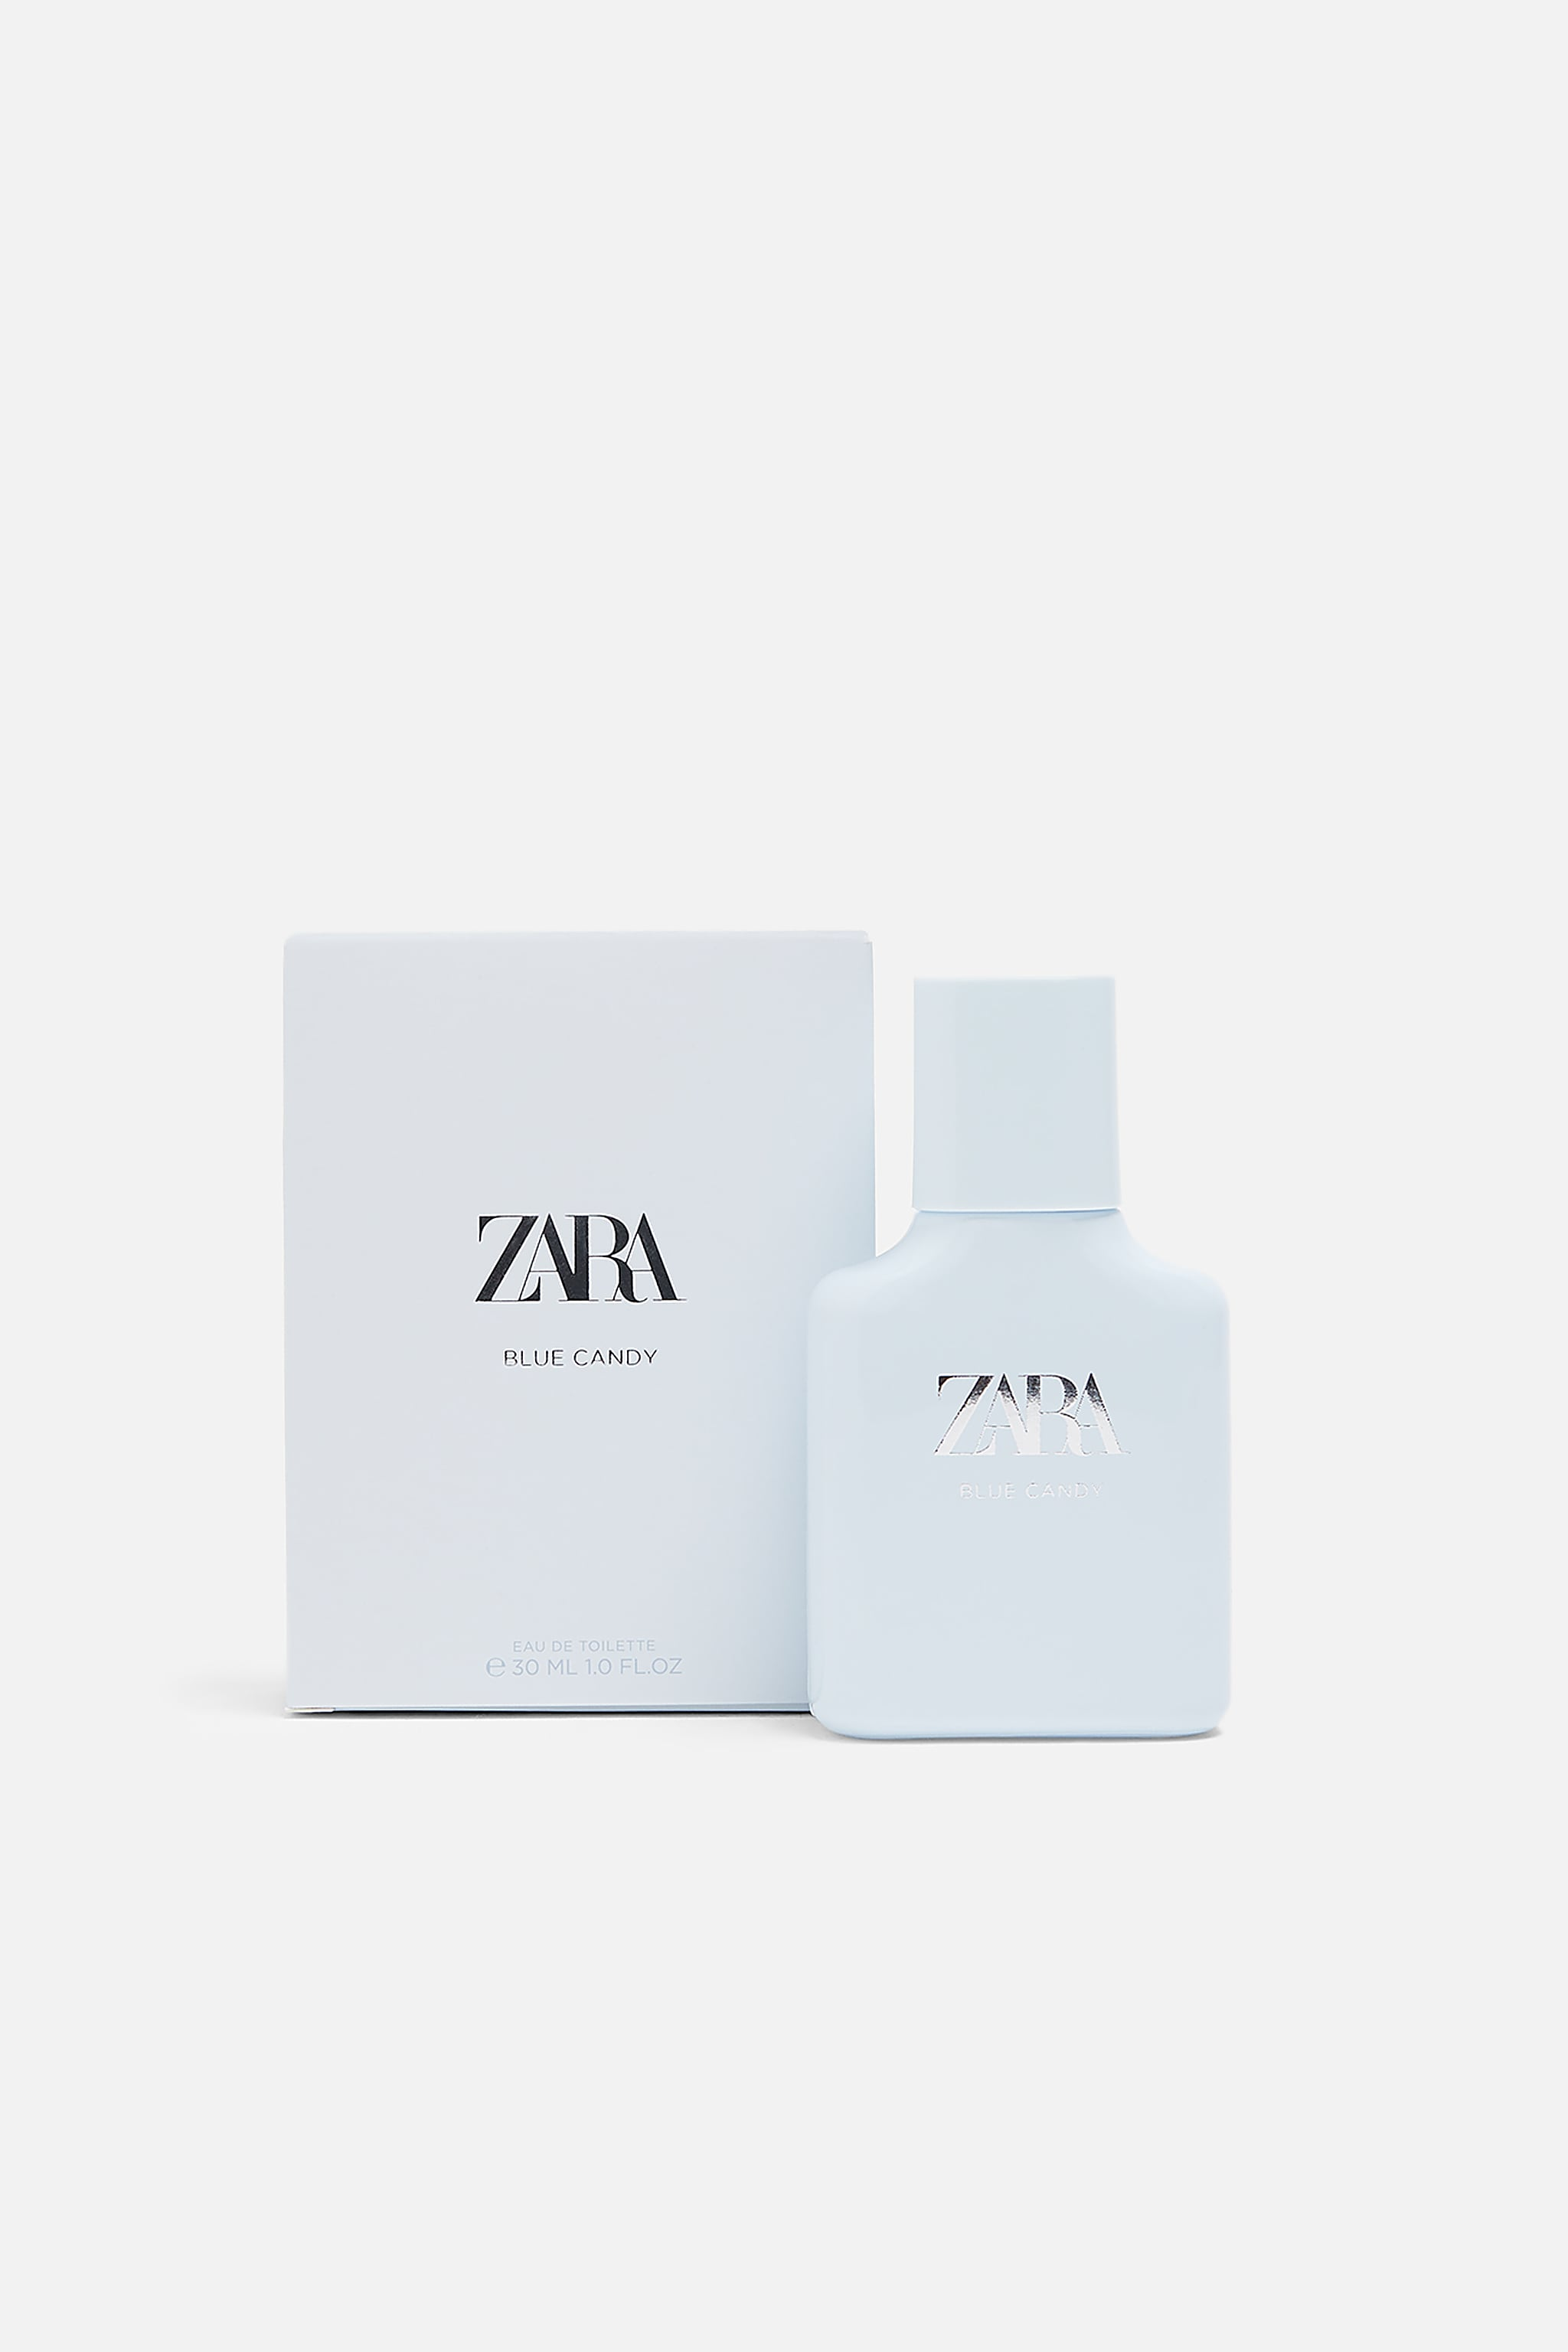 Zara BLUE CANDY 30 ML (1.0 FL. OZ)